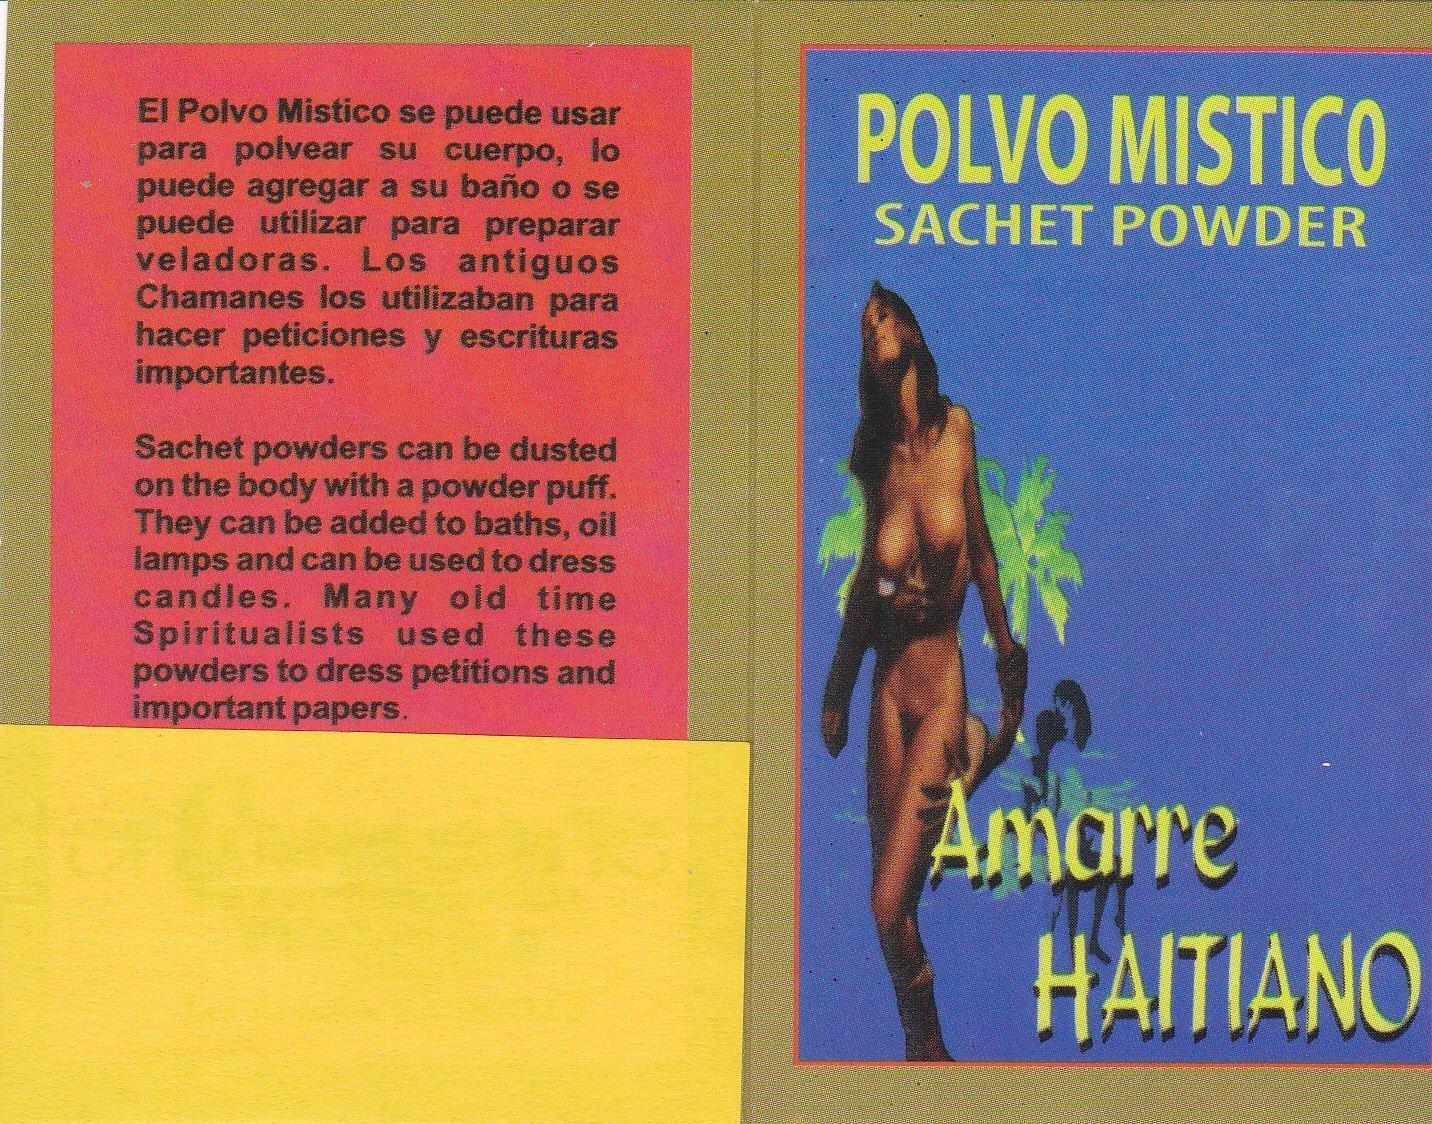 1 pkt. POLVO MISTICO AMARRE HAITIANO SACHET POWDER 1/2 oz pkt .... by Unknown (Image #2)